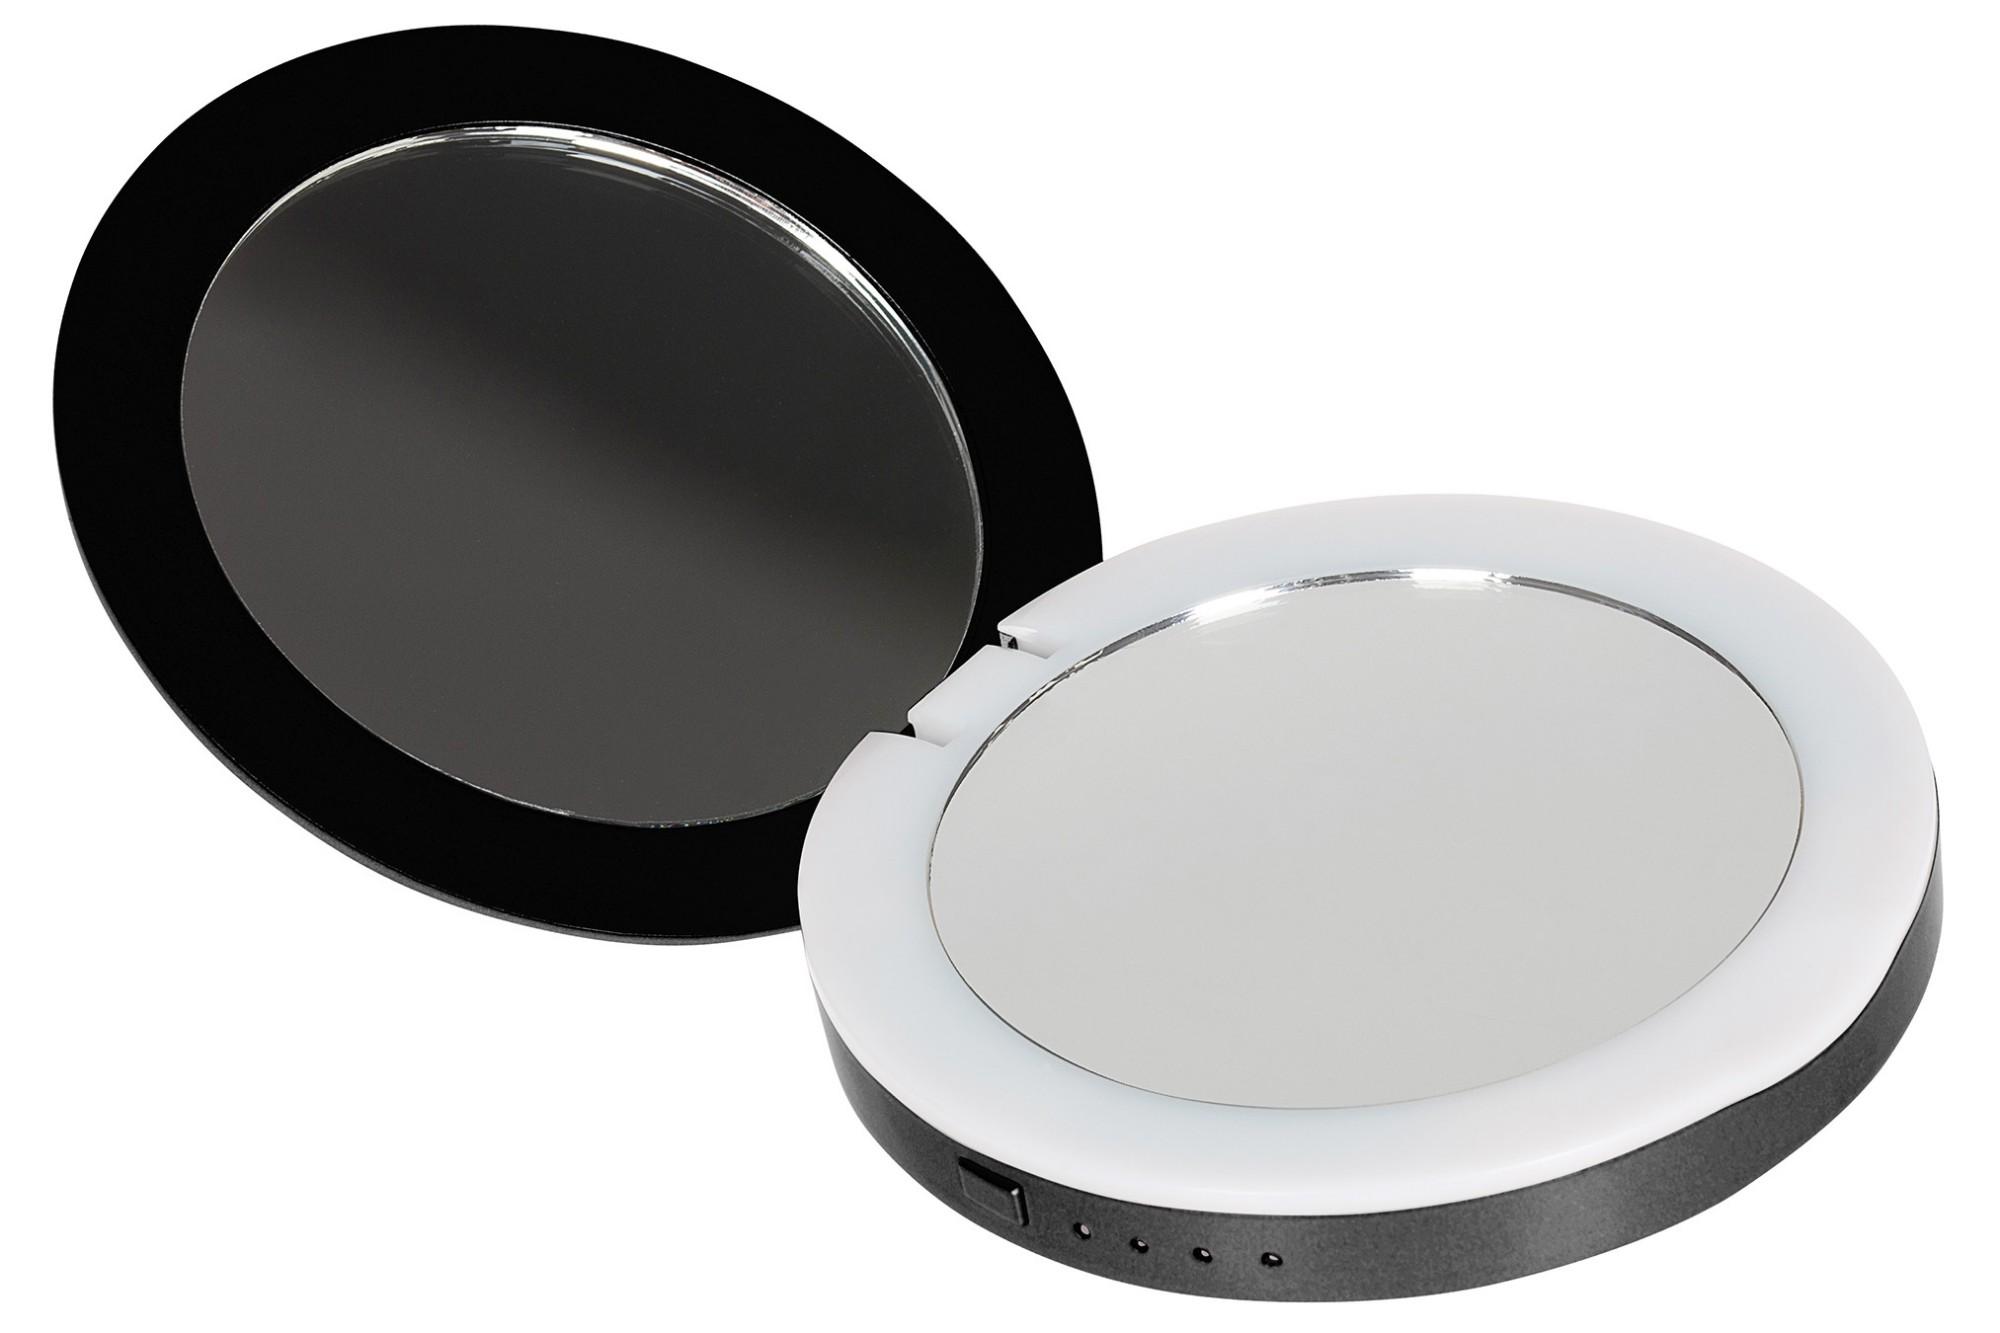 STATUS Compact Mirror 3000mAh Portable Power Bank with LED Illumination - Black